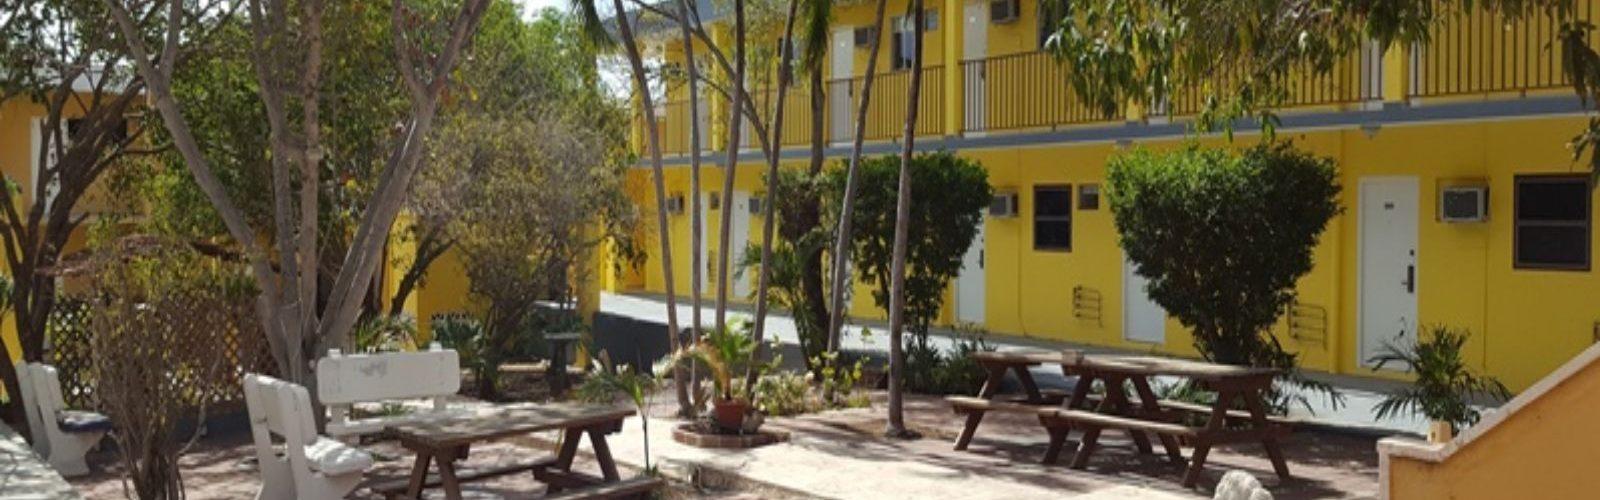 Bellisimaweg - Stage Curacao